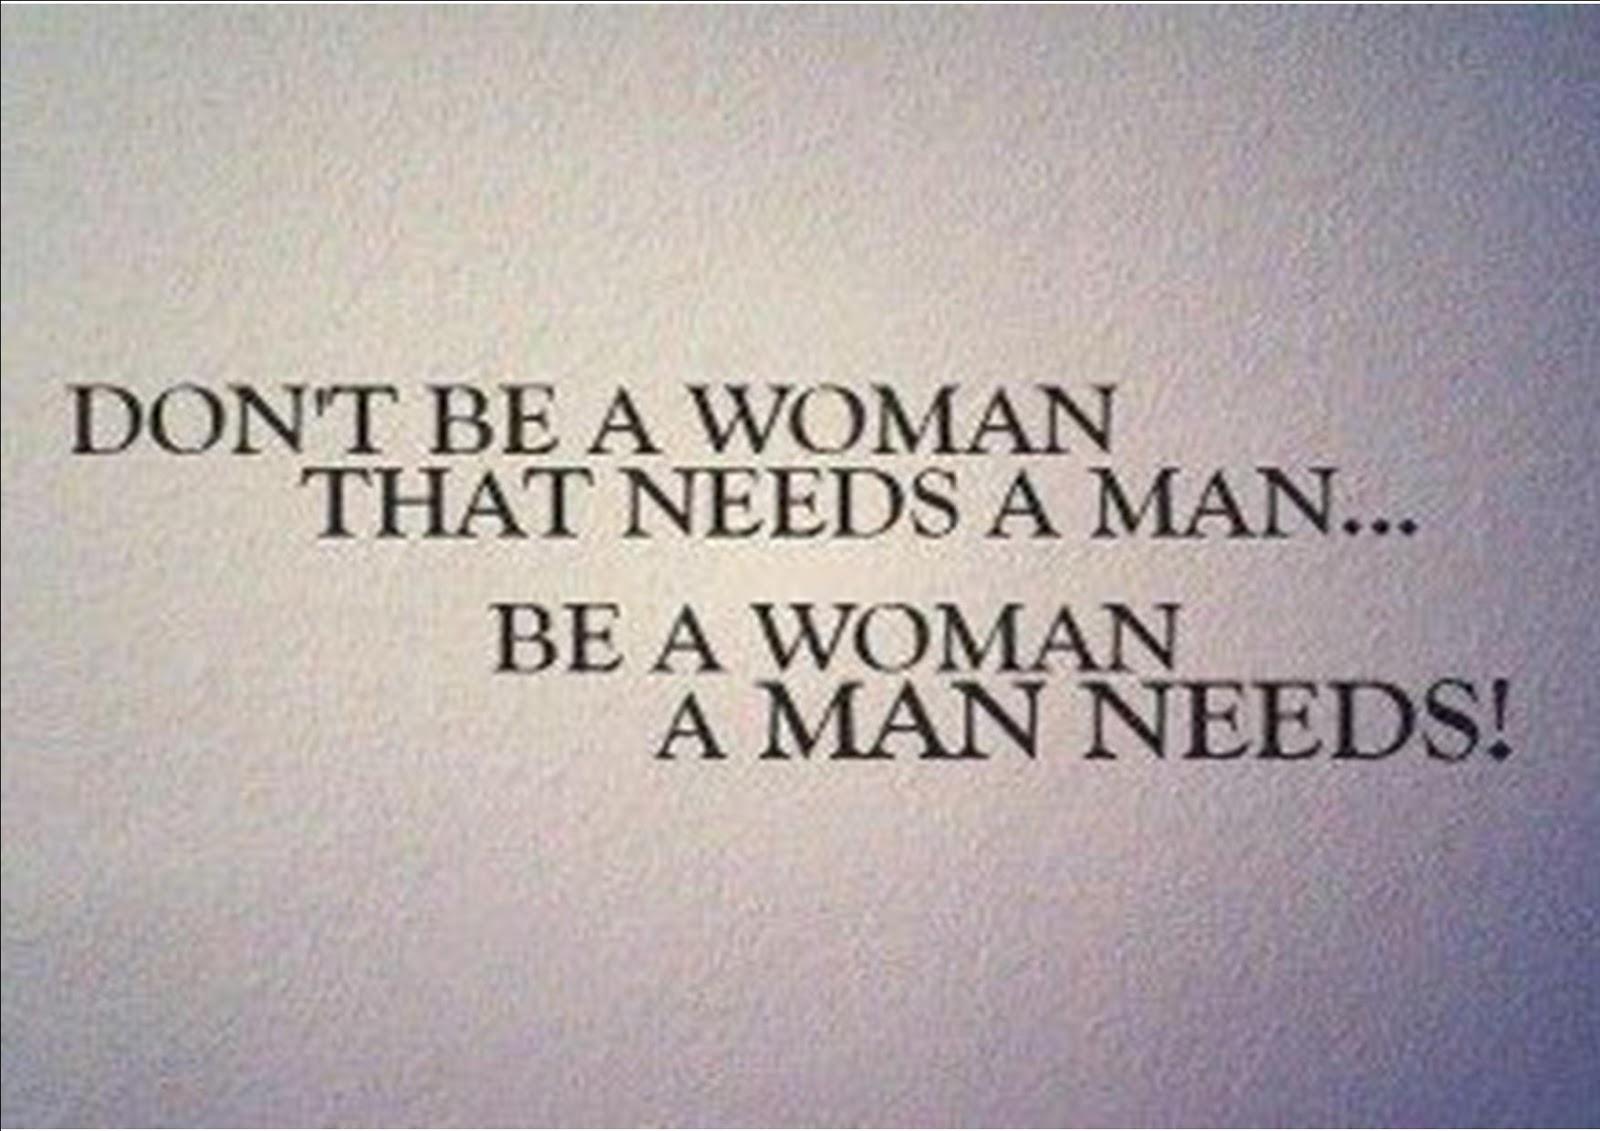 http://3.bp.blogspot.com/-JIpbUsjo9YQ/T2TS2vevBpI/AAAAAAAAMm4/RnT6_K58nsM/s1600/womenquotes_lifequotes1.jpg